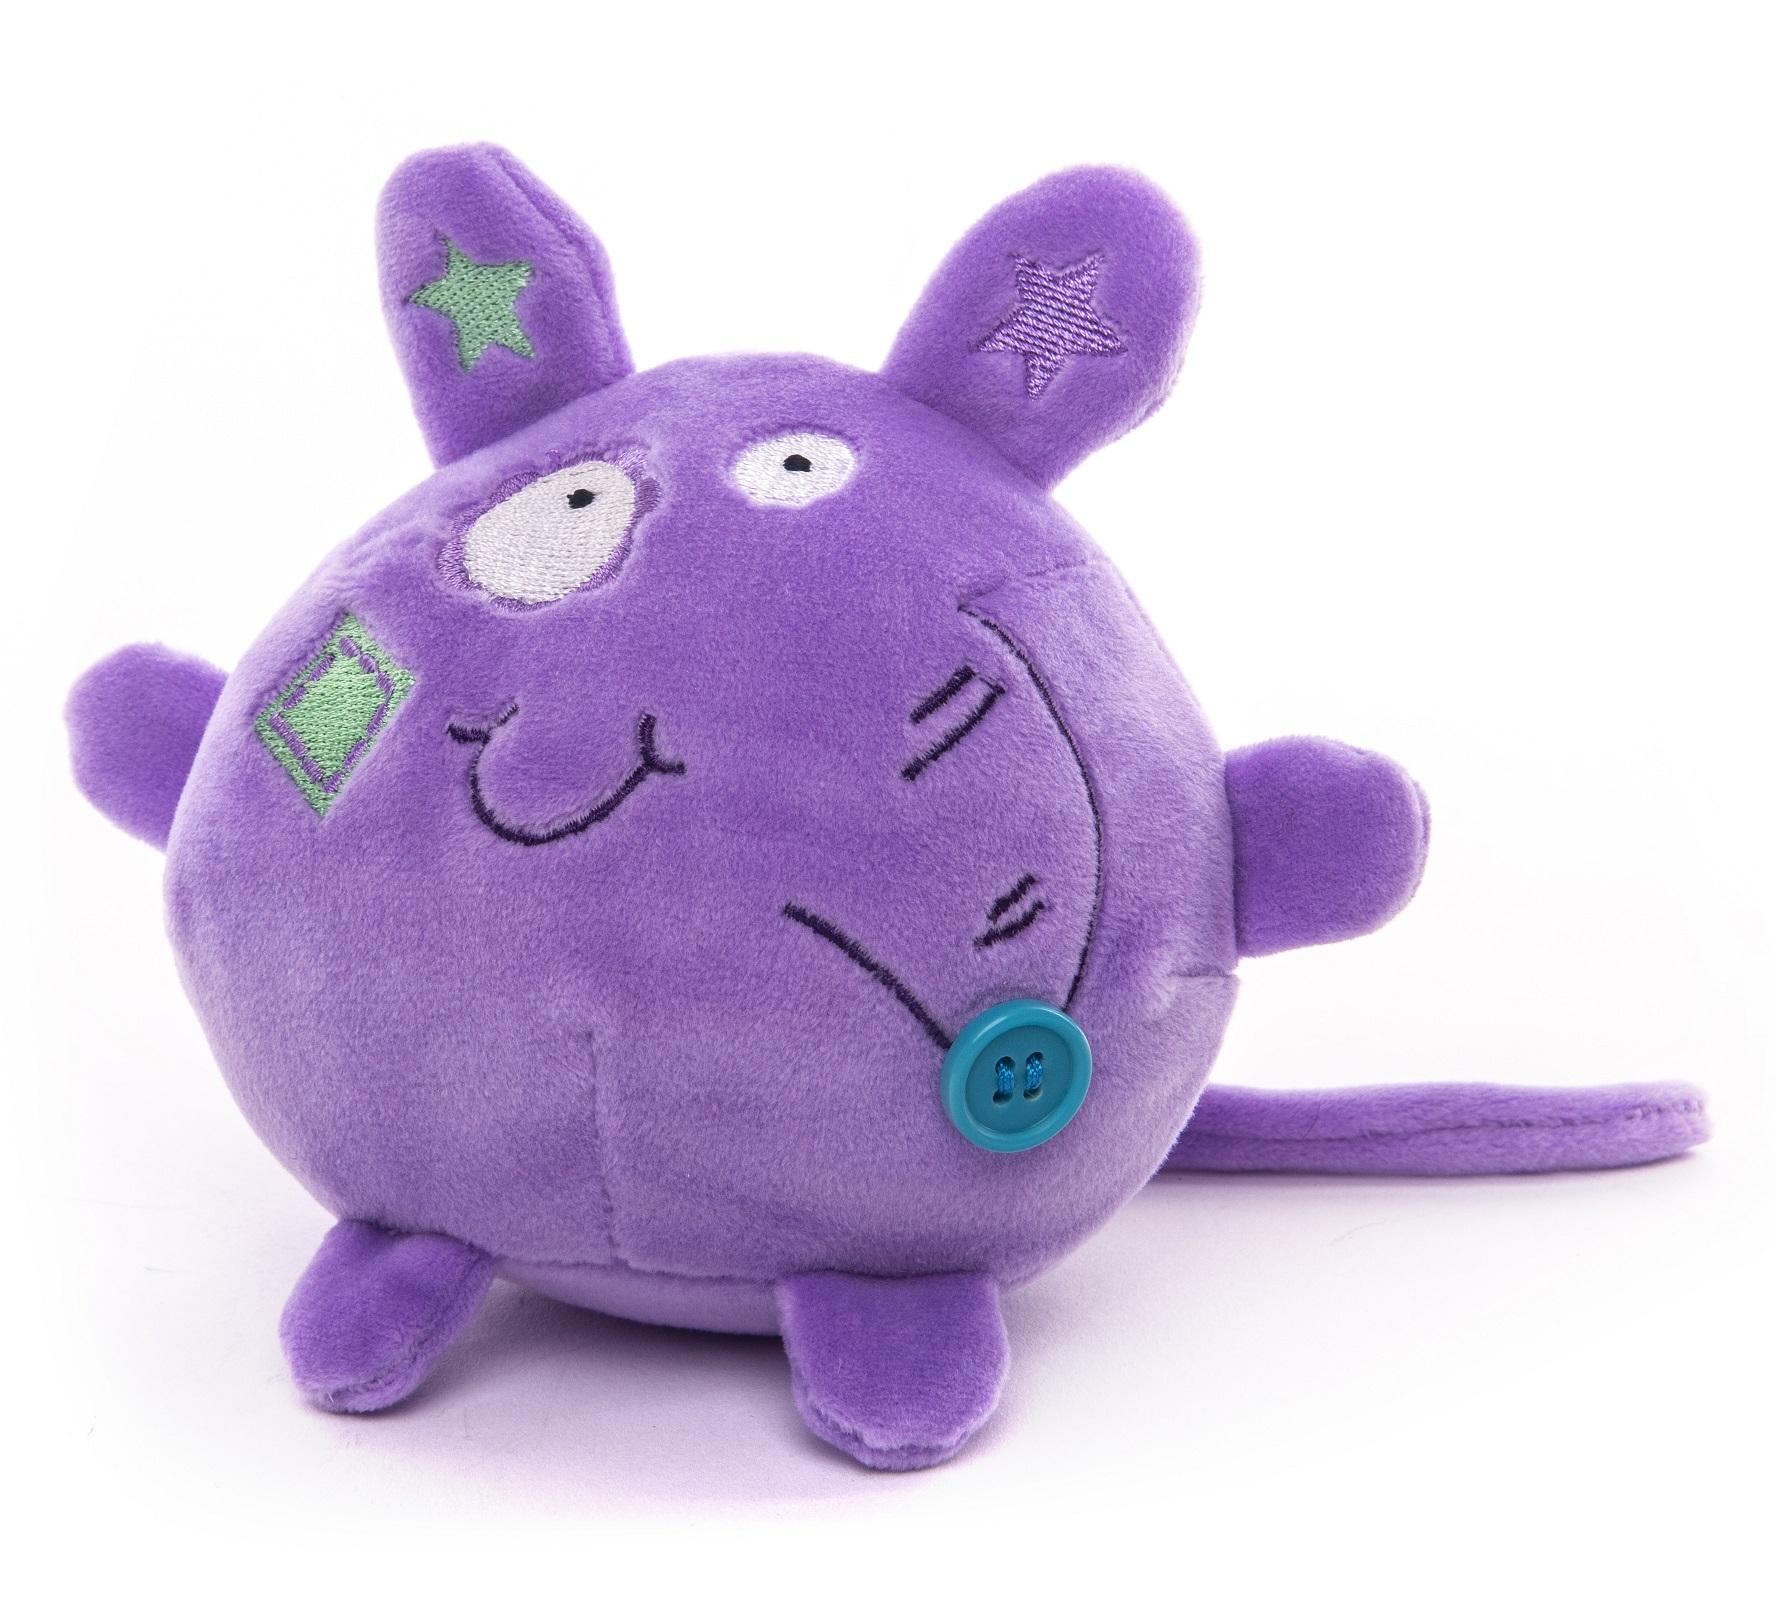 Button Blue мягкая игрушка Мышка фиолетовая